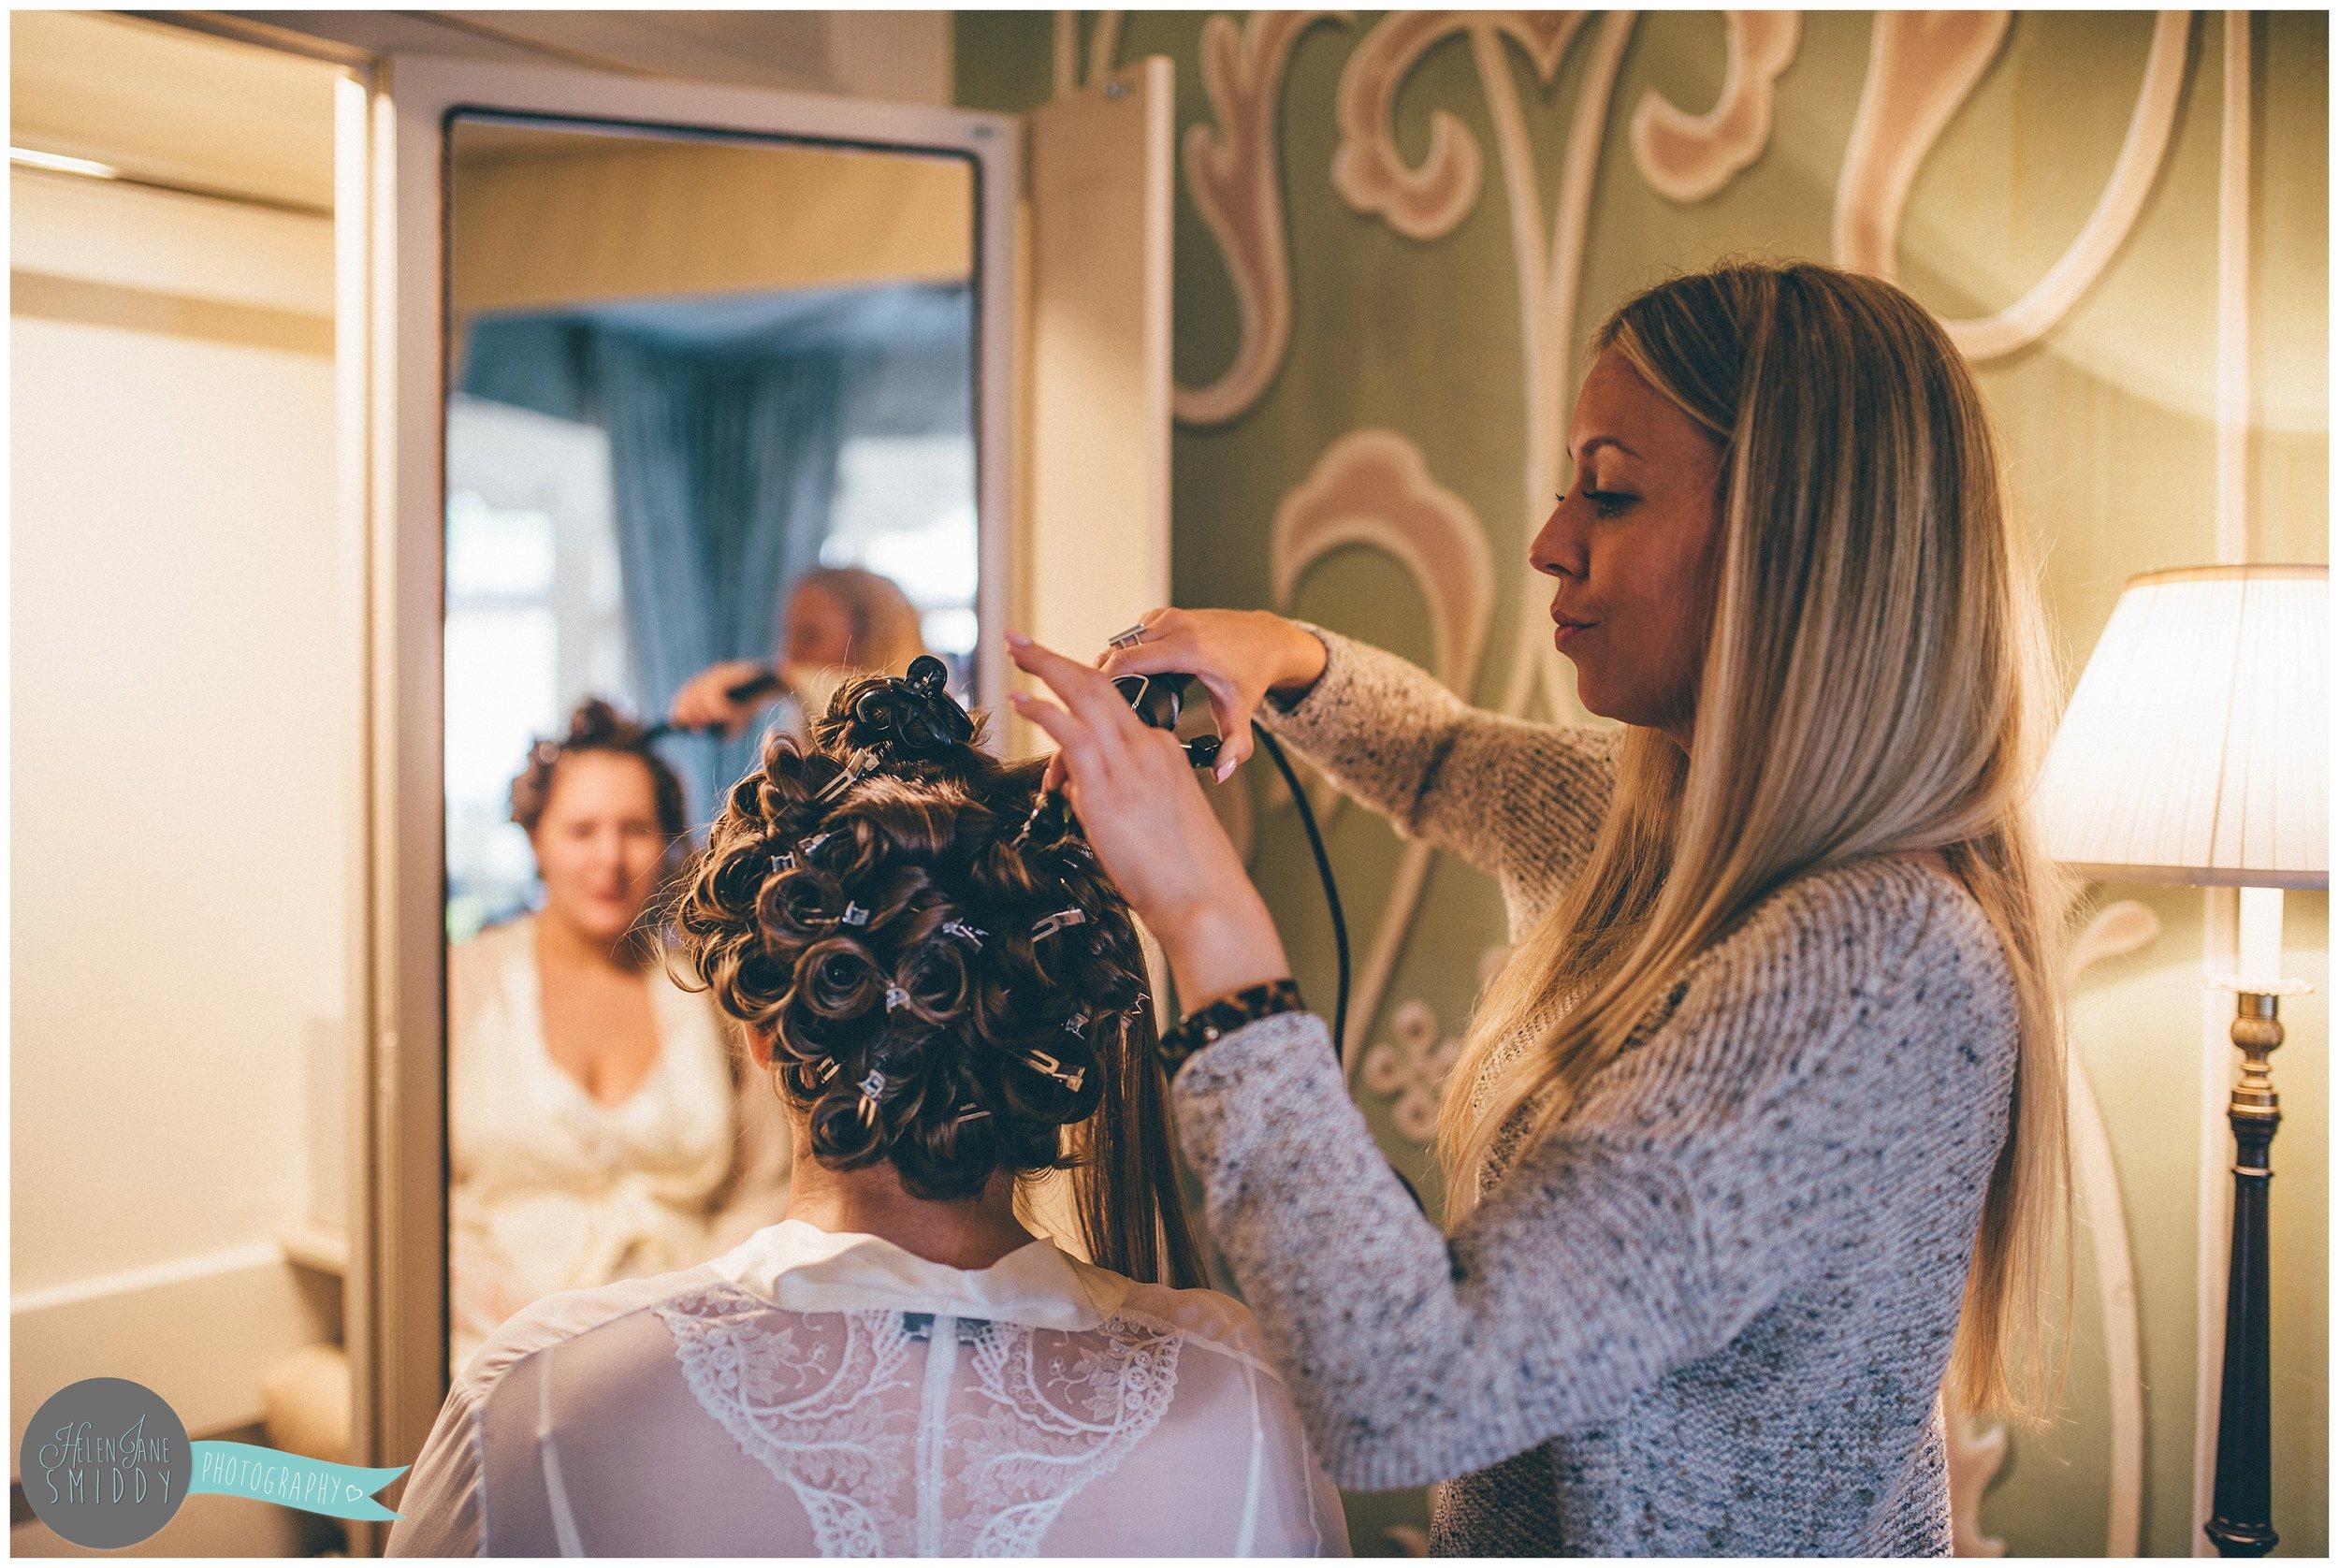 lemanoir-belmondlemanoir-belmondlemanoirauxquatsaisons-oxfordshire-oxfordshirewedding-weddingphotographer-cheshireweddingphotographer-cheshireweddingphotography-raymondblanc-fivestar-michelinstar-weddinghair-mac-macmakeup